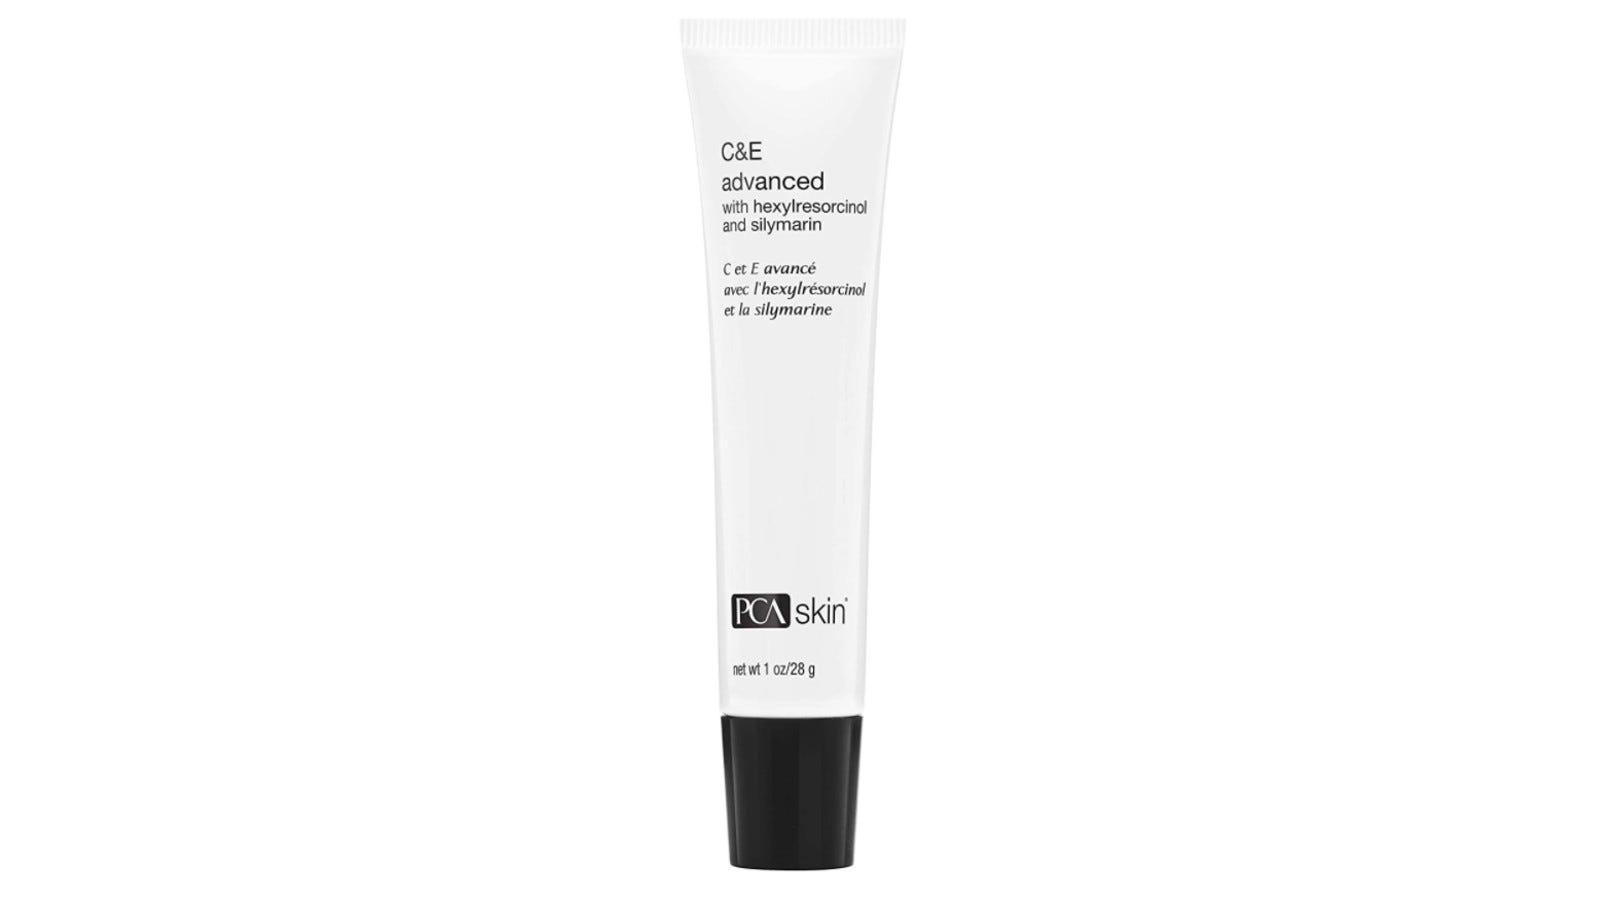 white and black tube of PCA skin vitamin C serum